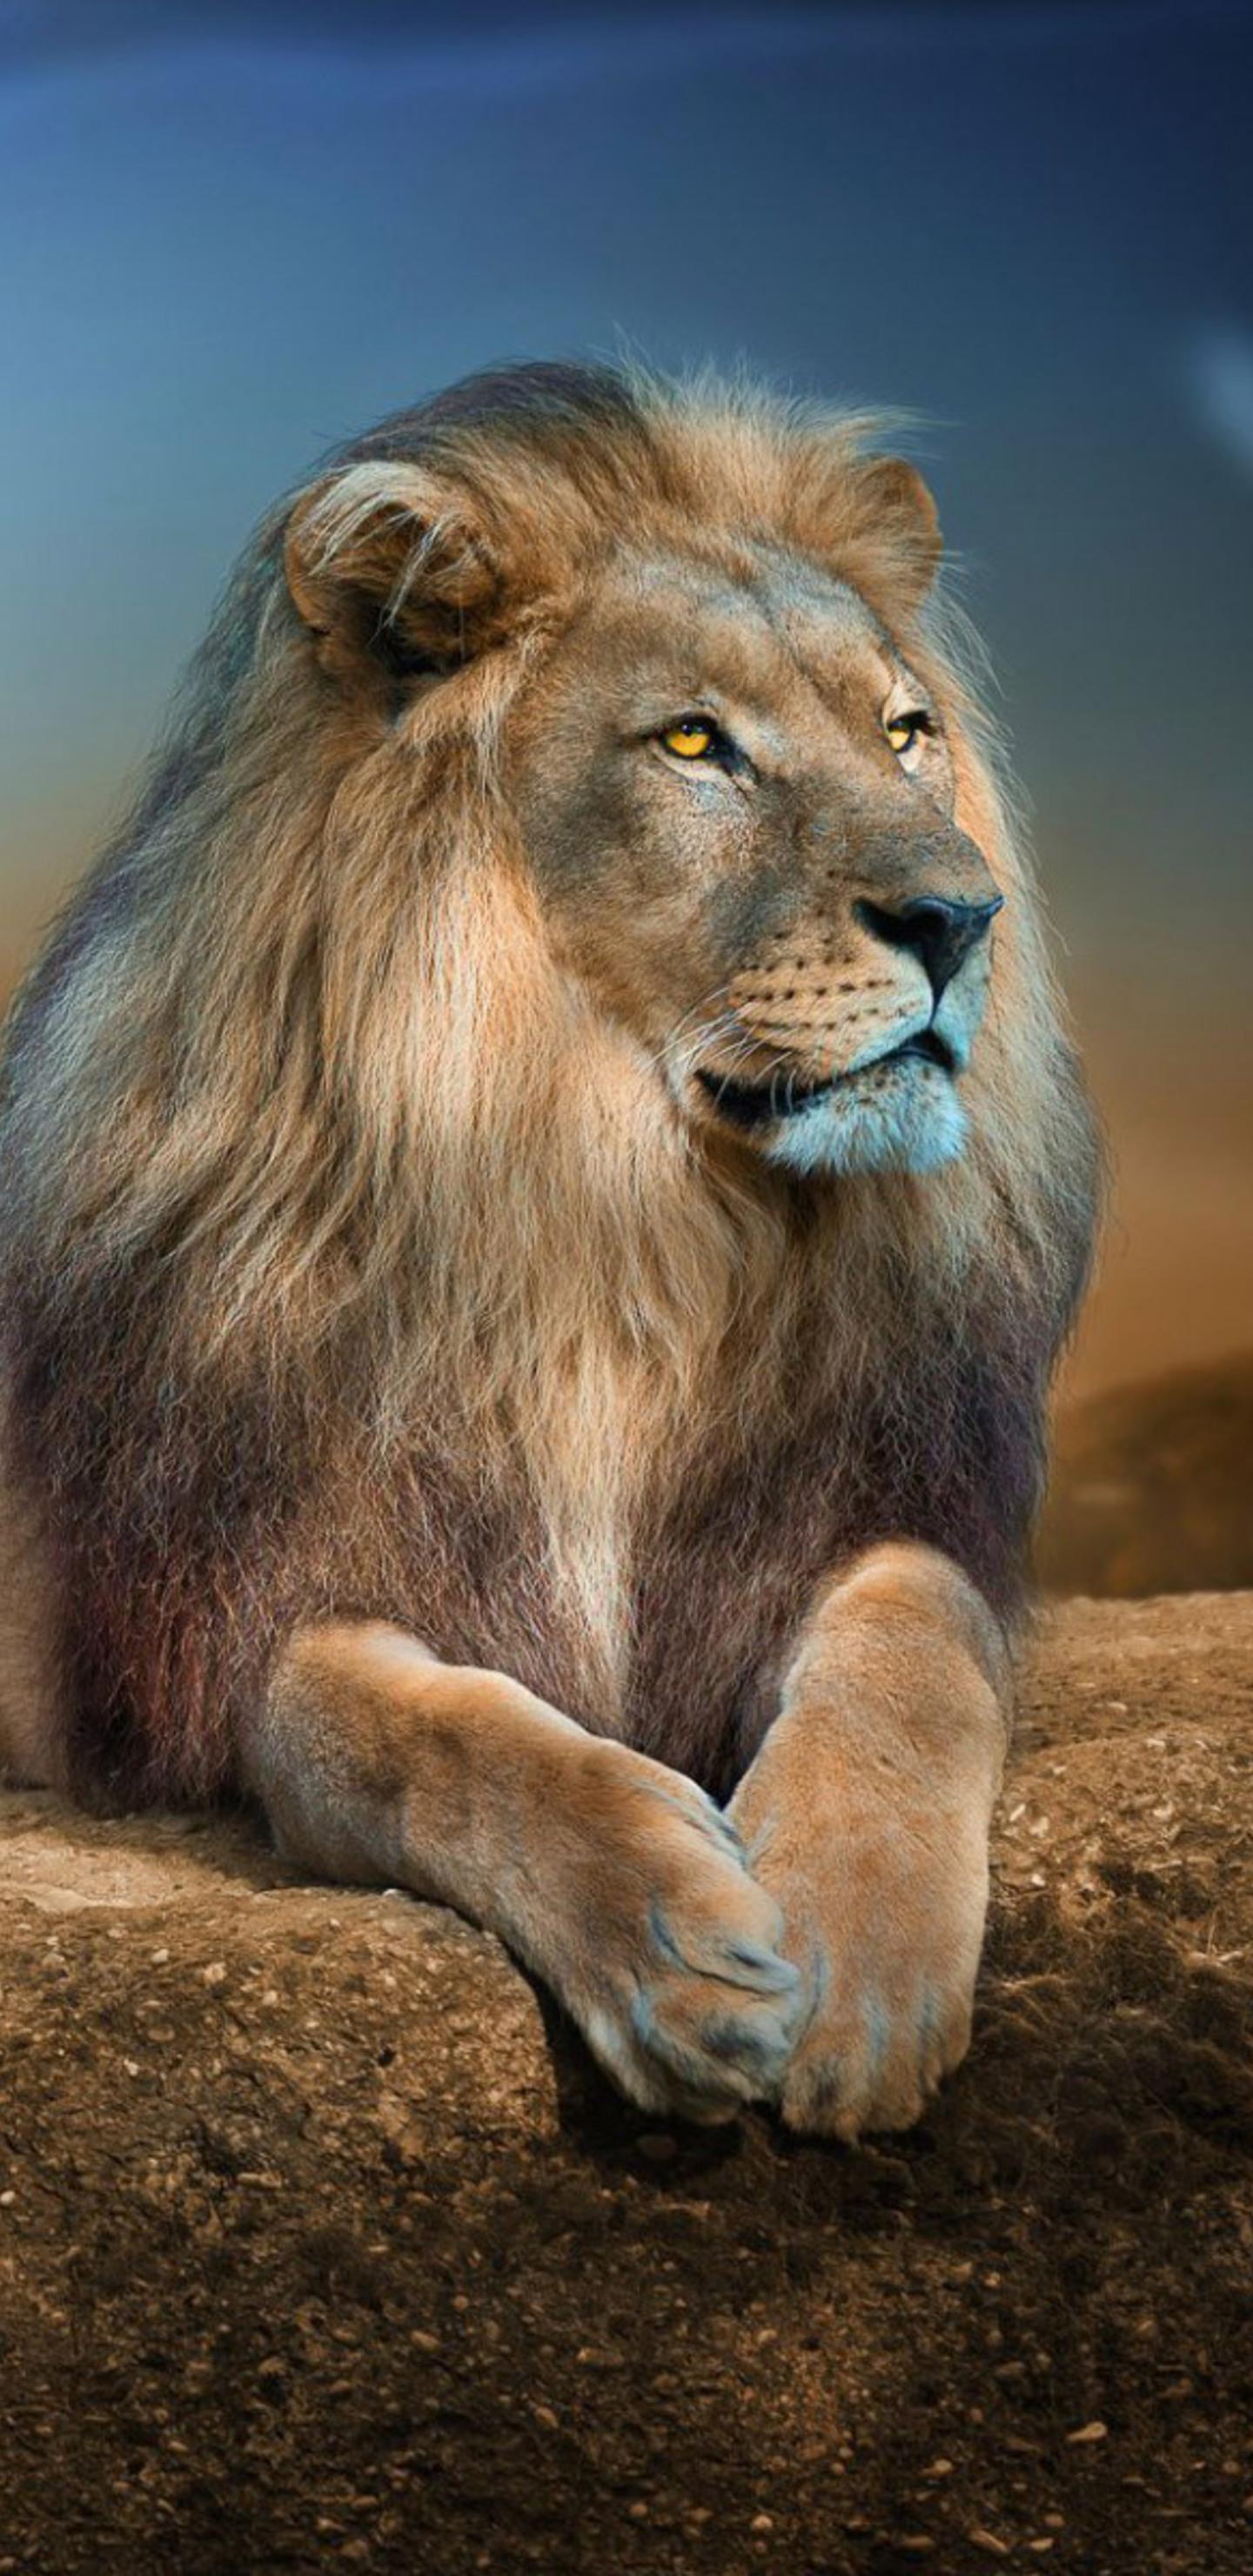 1440x2960 Lion 2 Samsung Galaxy Note 9 8 S9 S8 S8 Qhd Hd 4k